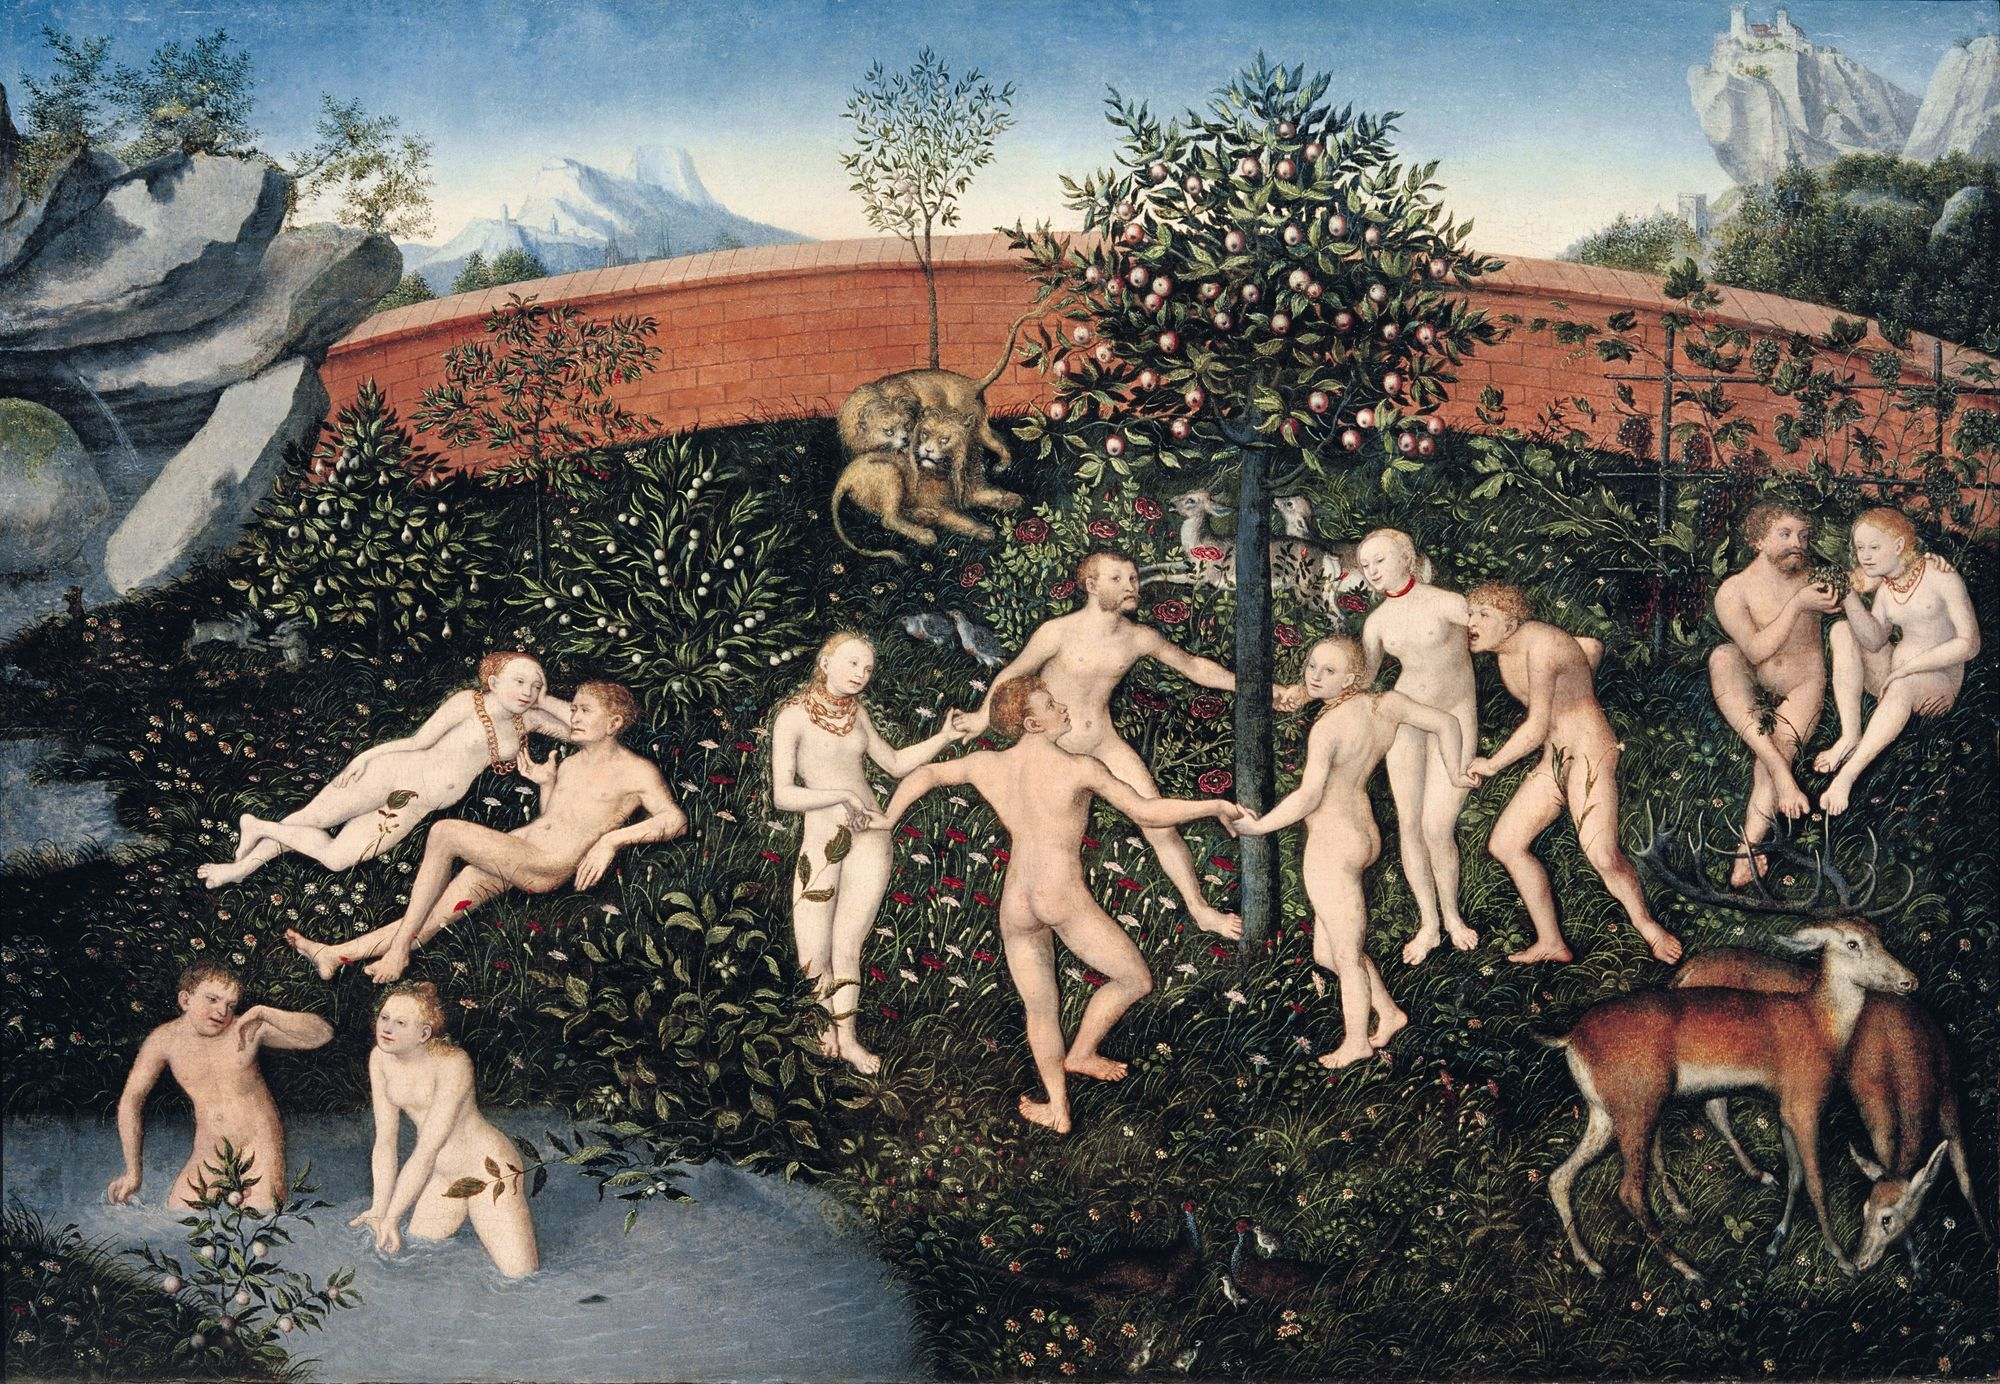 Lucas Cranach l'Ancien, L'Âge d'or